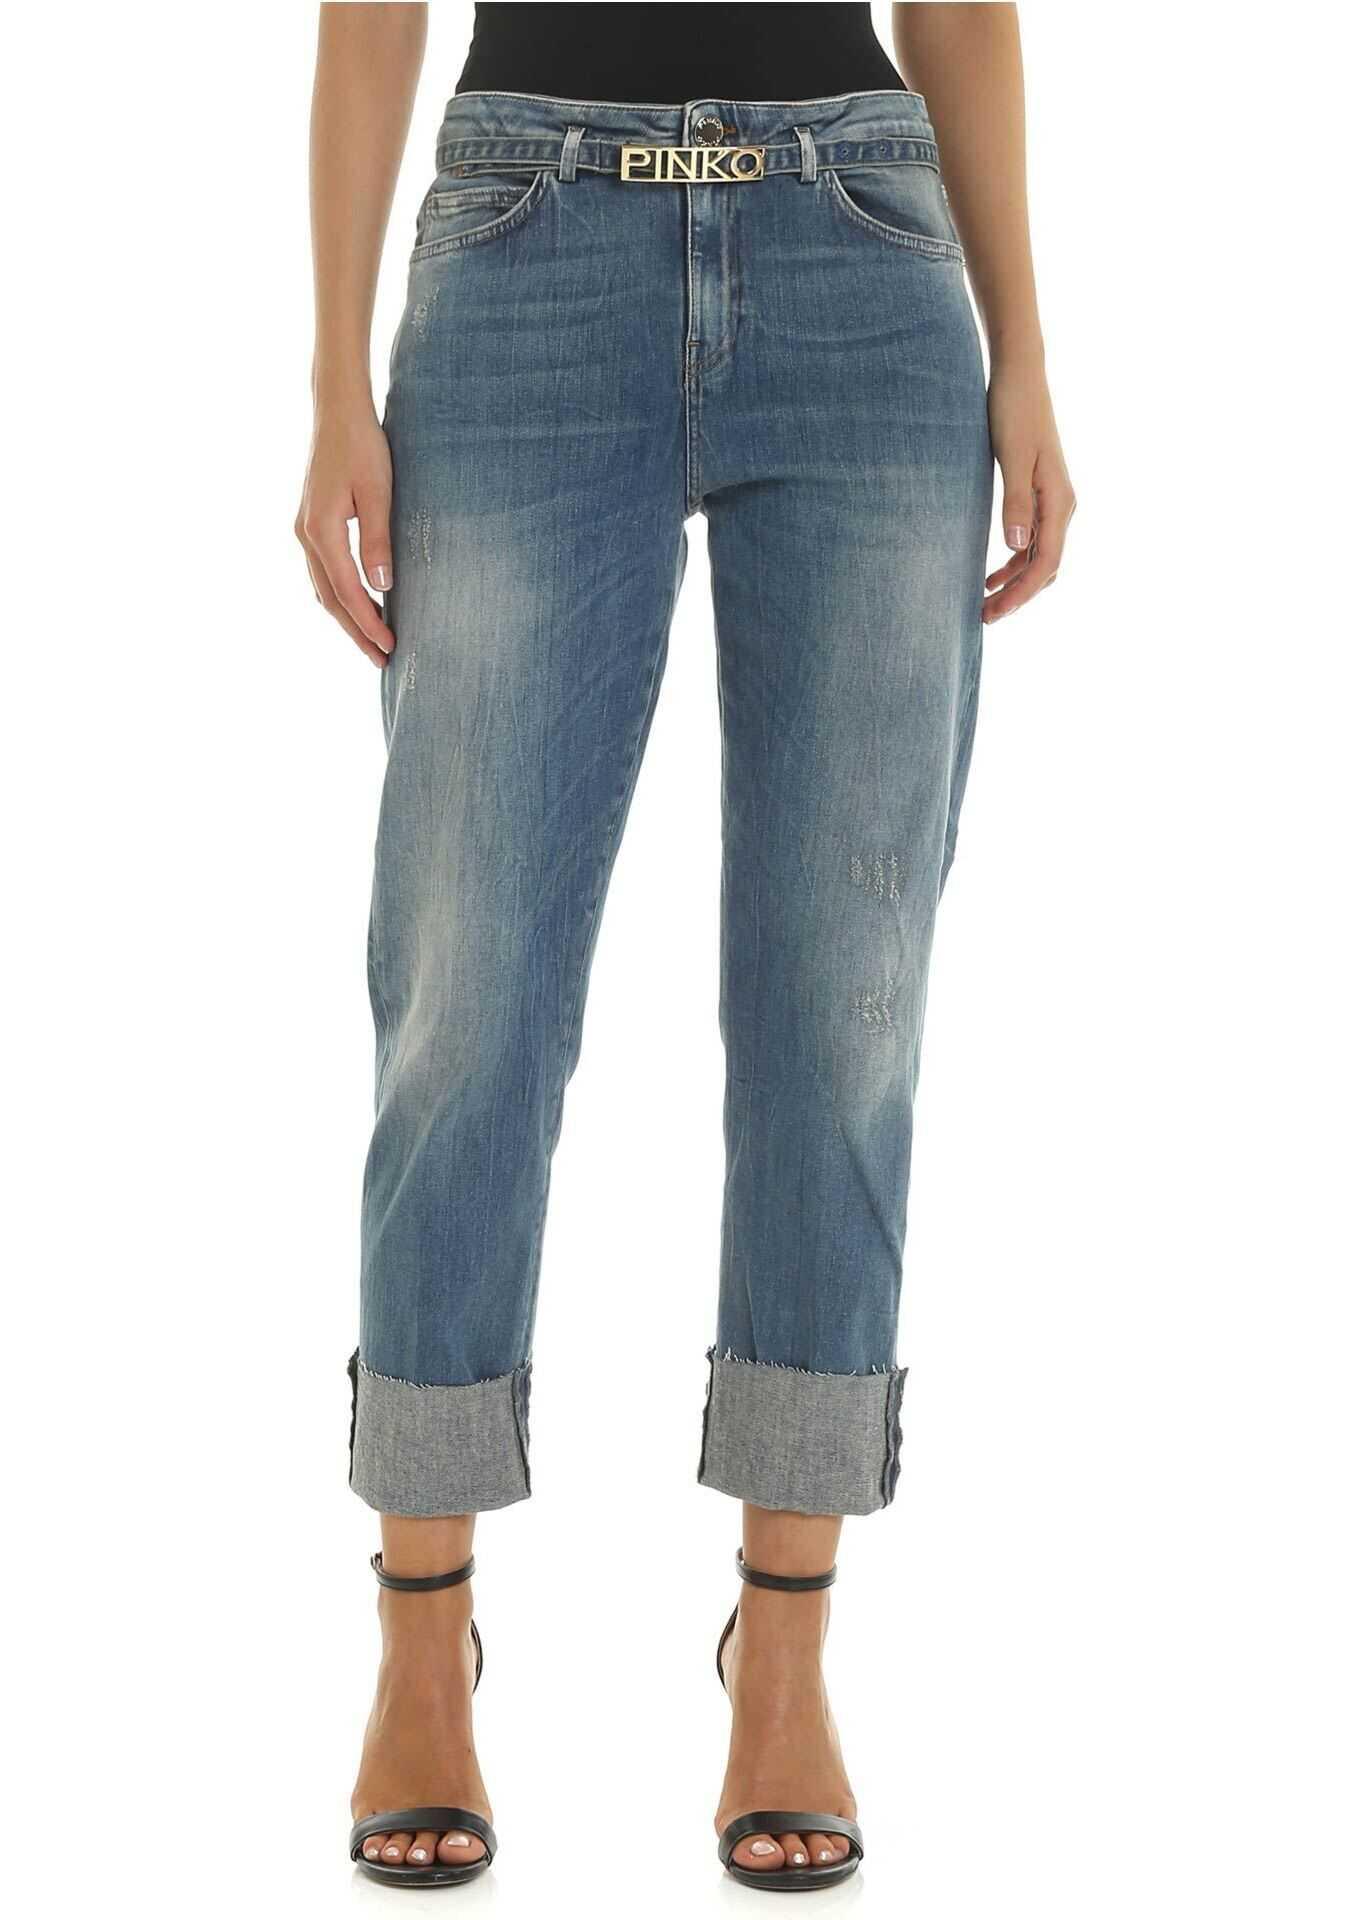 Pinko Becca 2 Jeans In Blue Light Blue